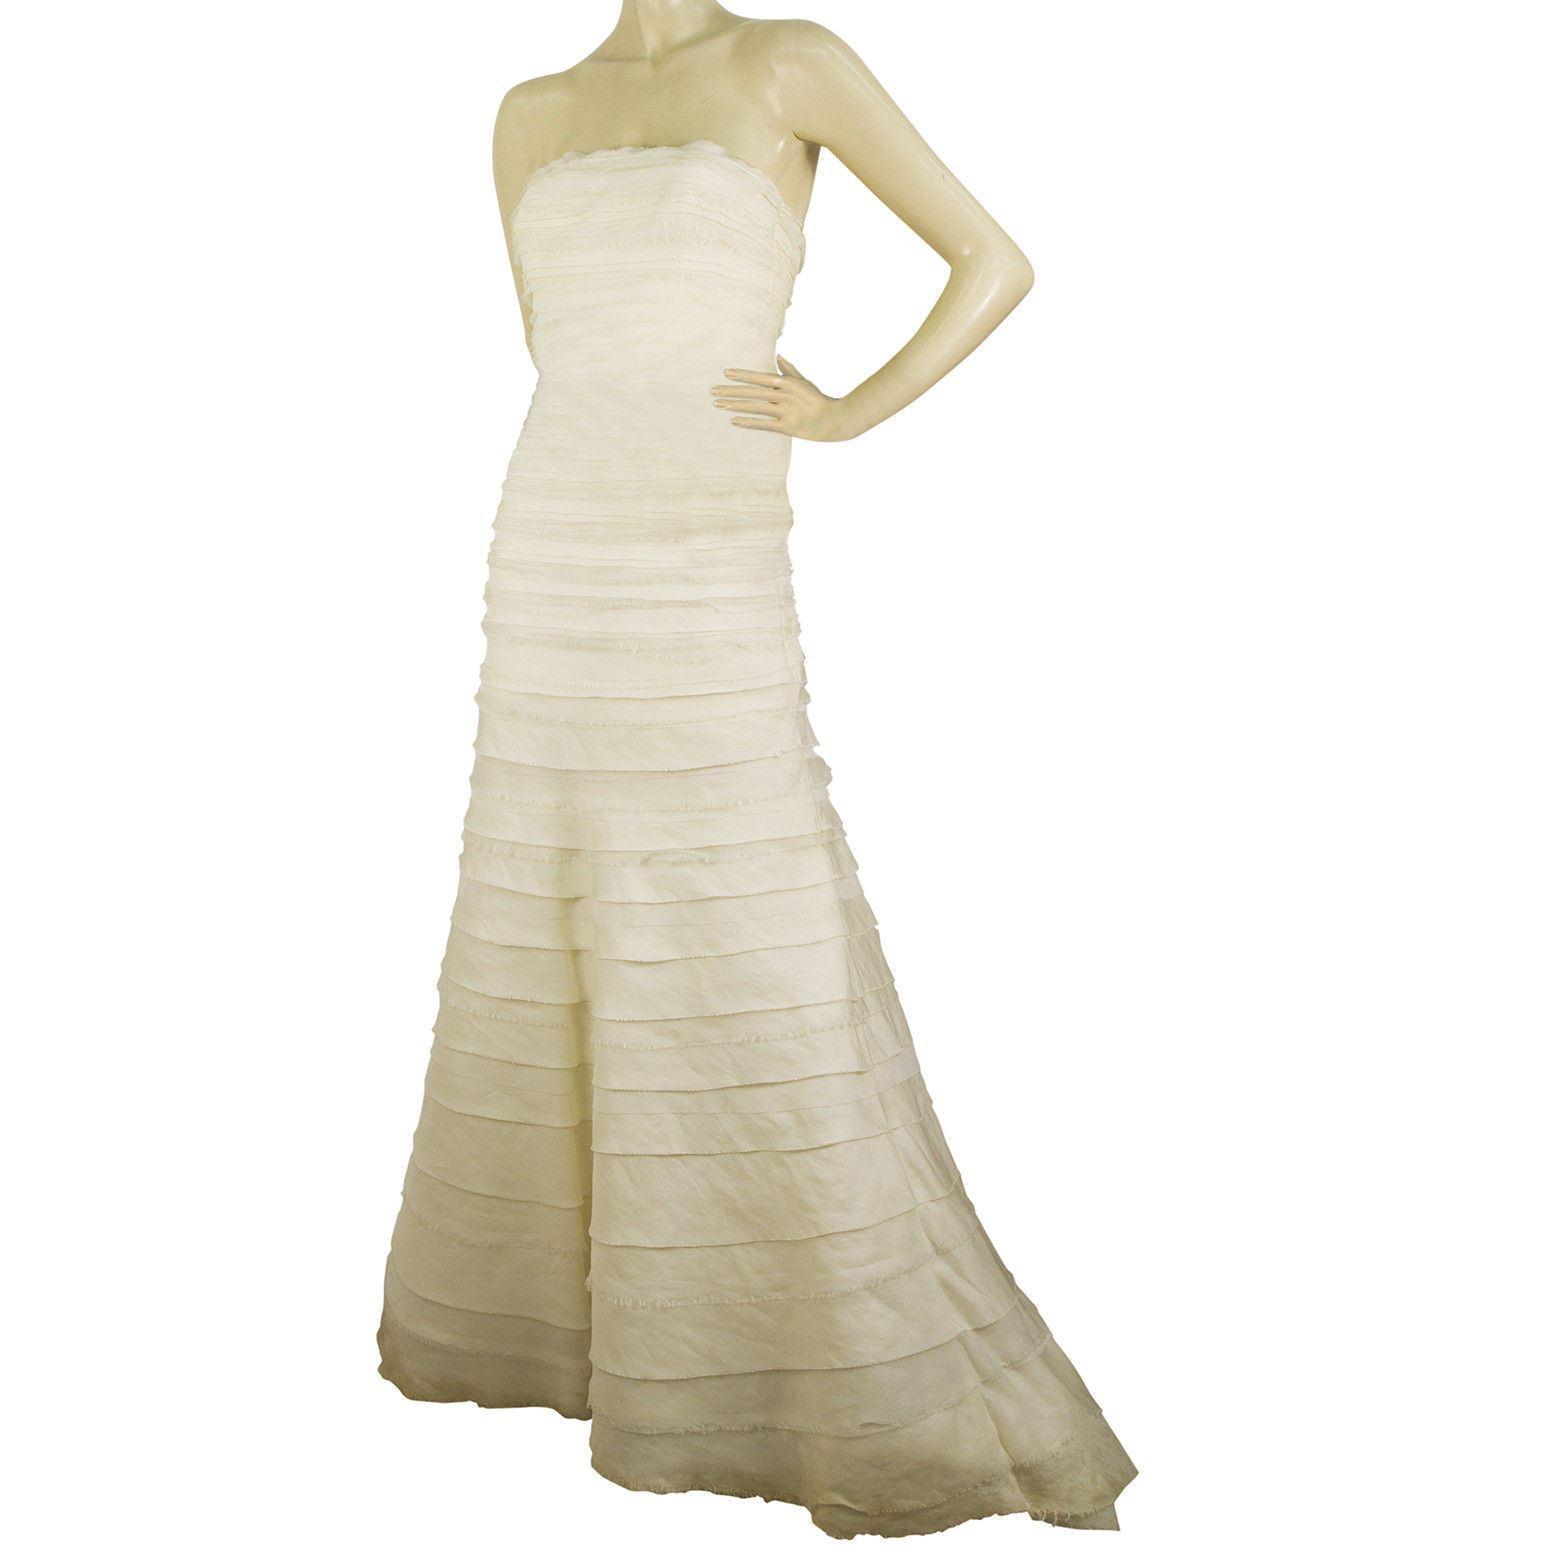 Vera Wang Silk Floor Length Bridal Wedding Gown Dress Strapless US 8 EU 42 image 3